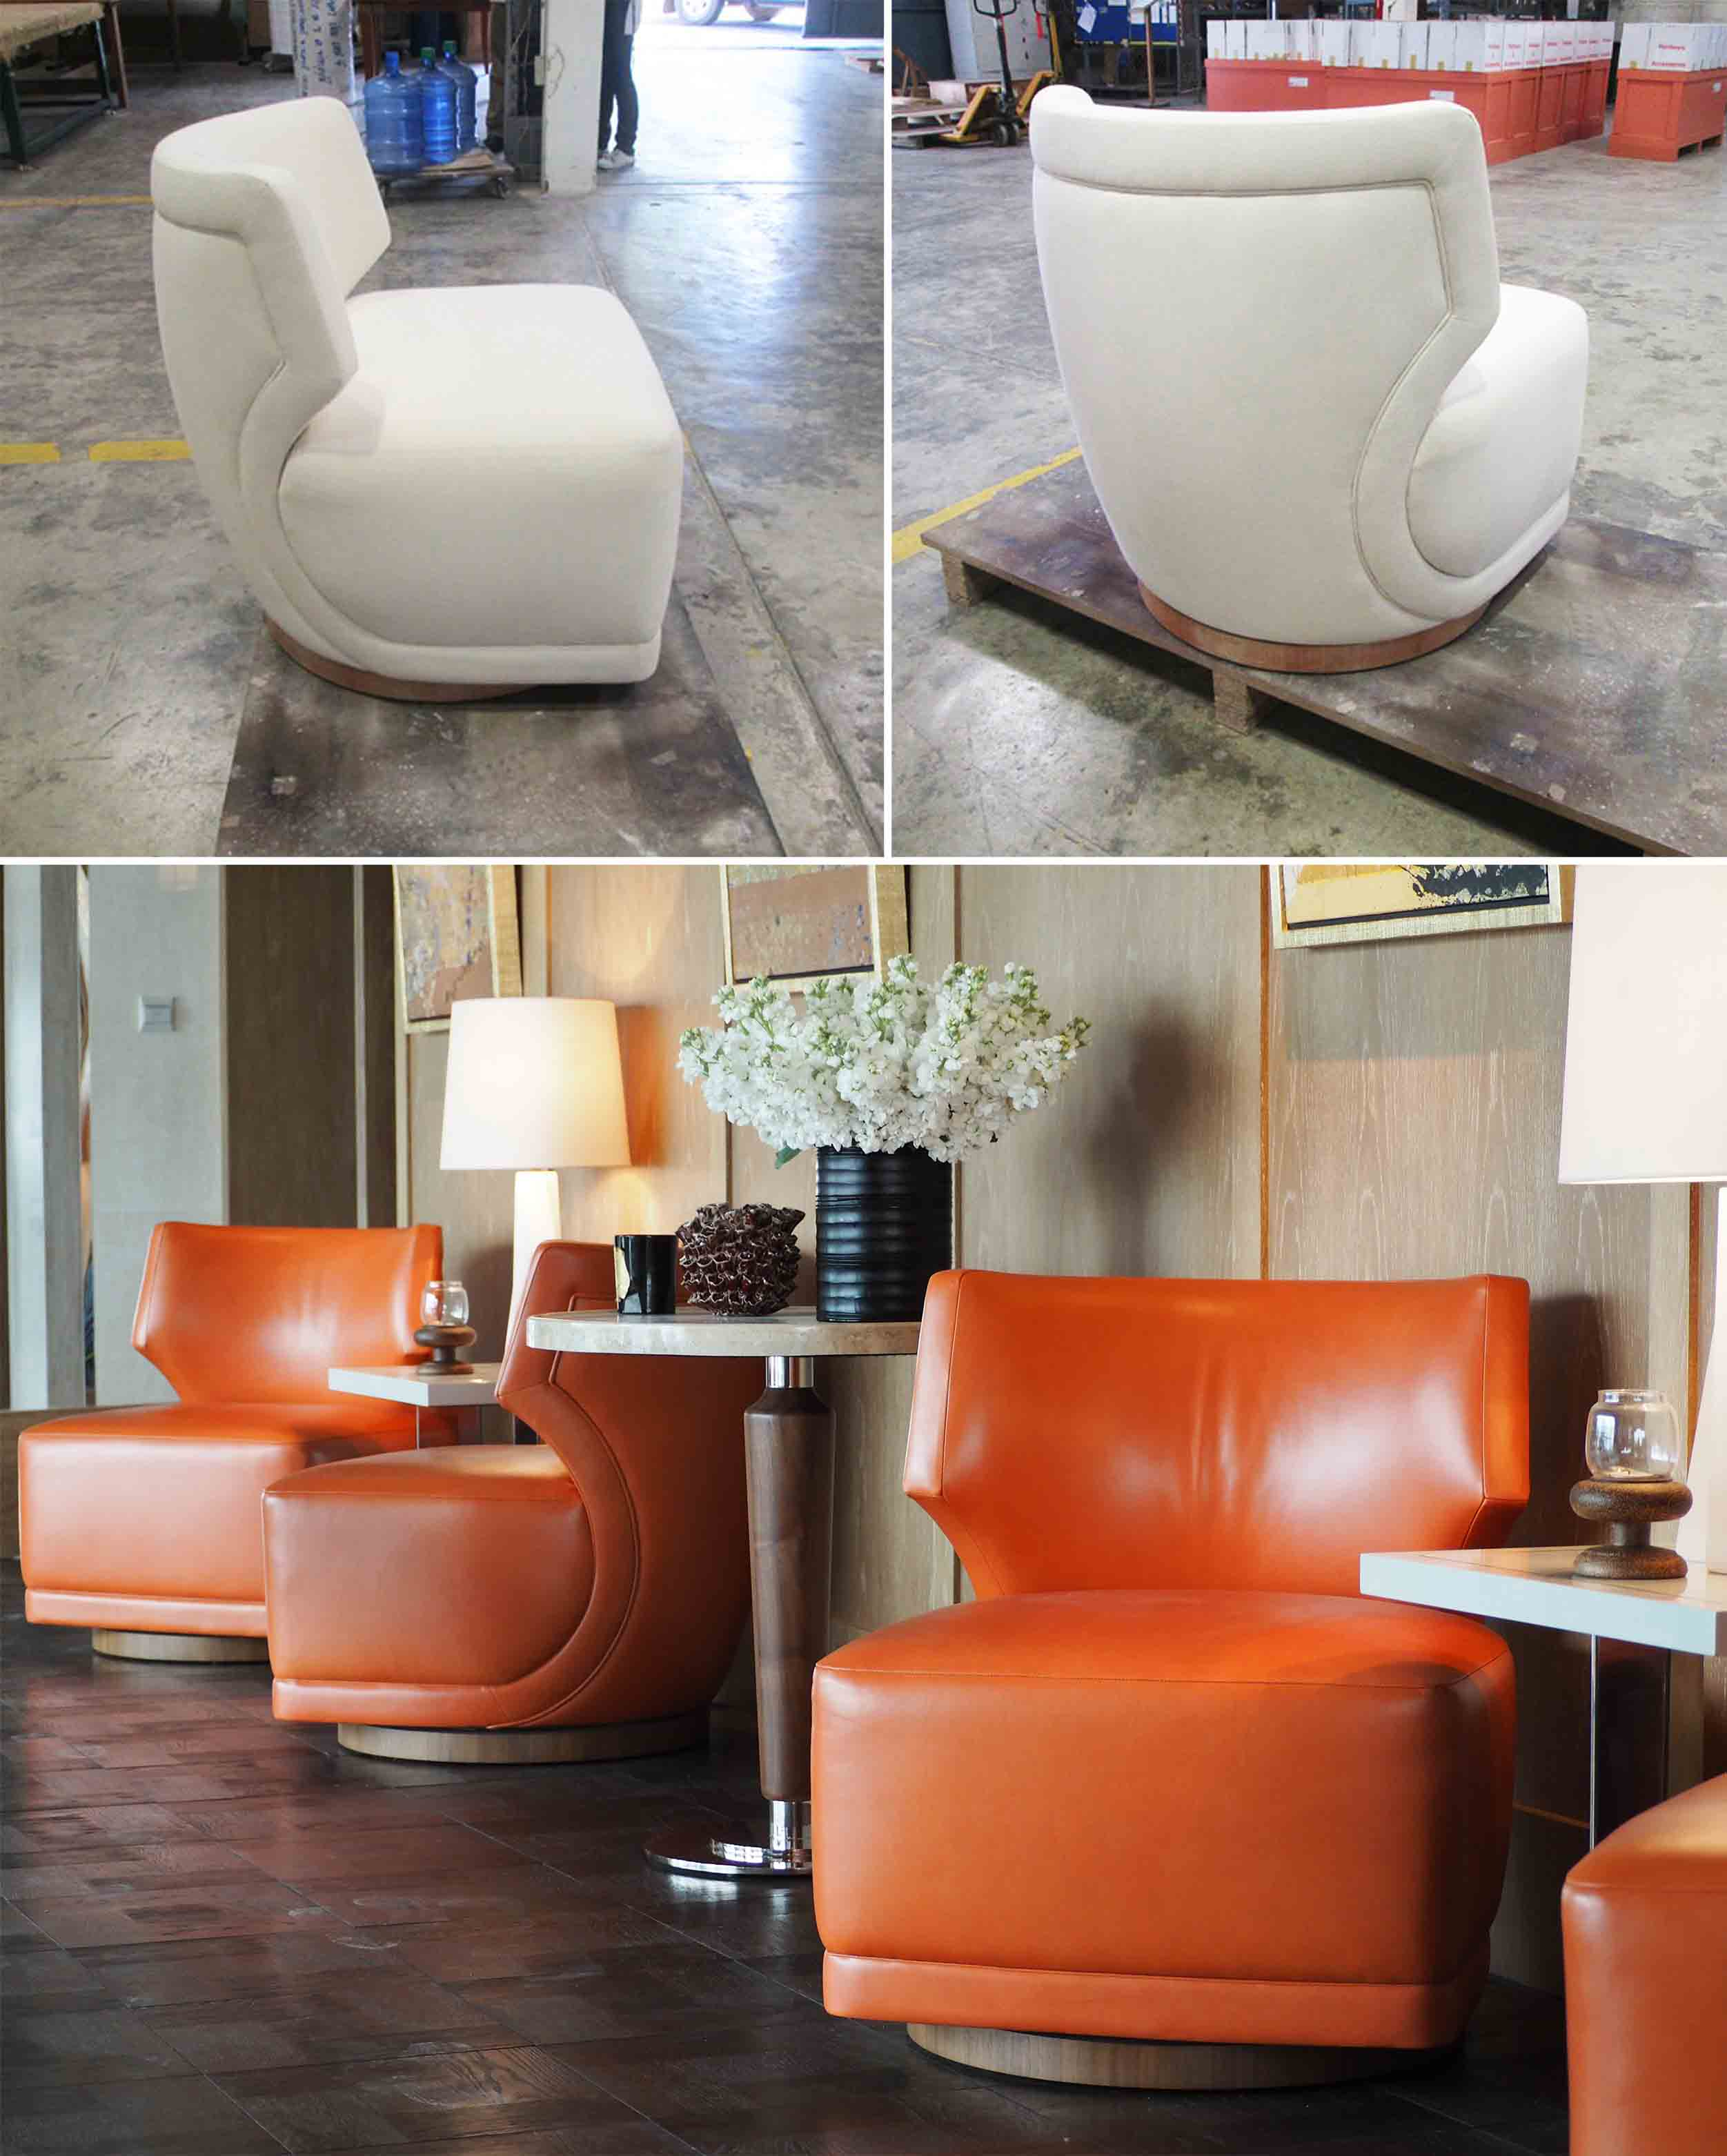 The Ritz Carlton Residences prototype lounge chair